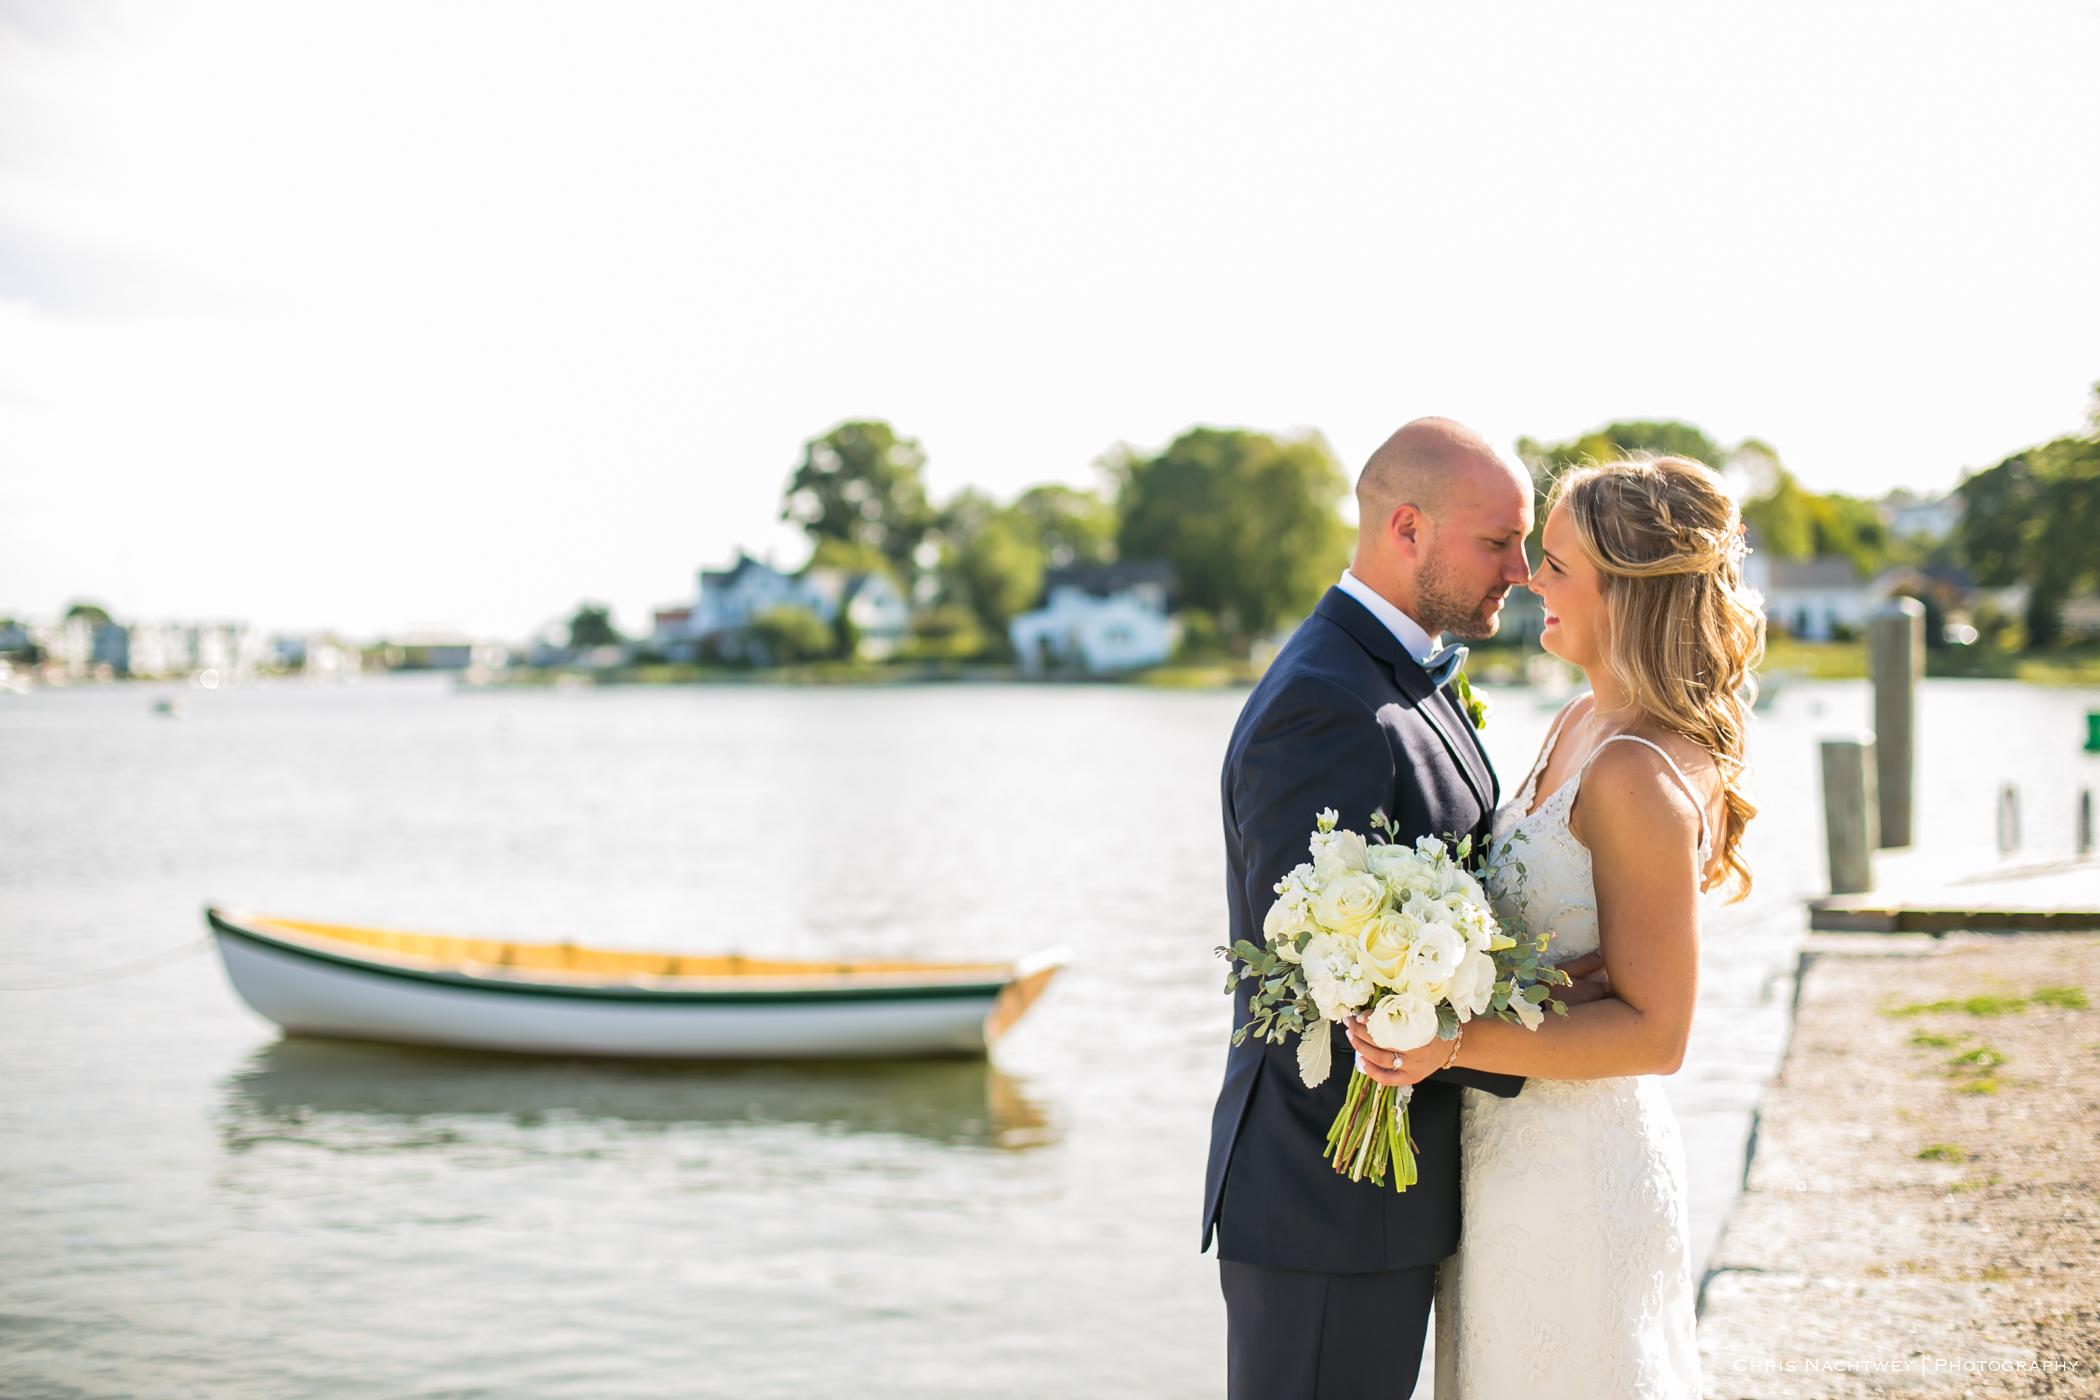 mystic-ct-artistic-wedding-photographers-chris-nachtwey-tany-mike-2017-18.jpg